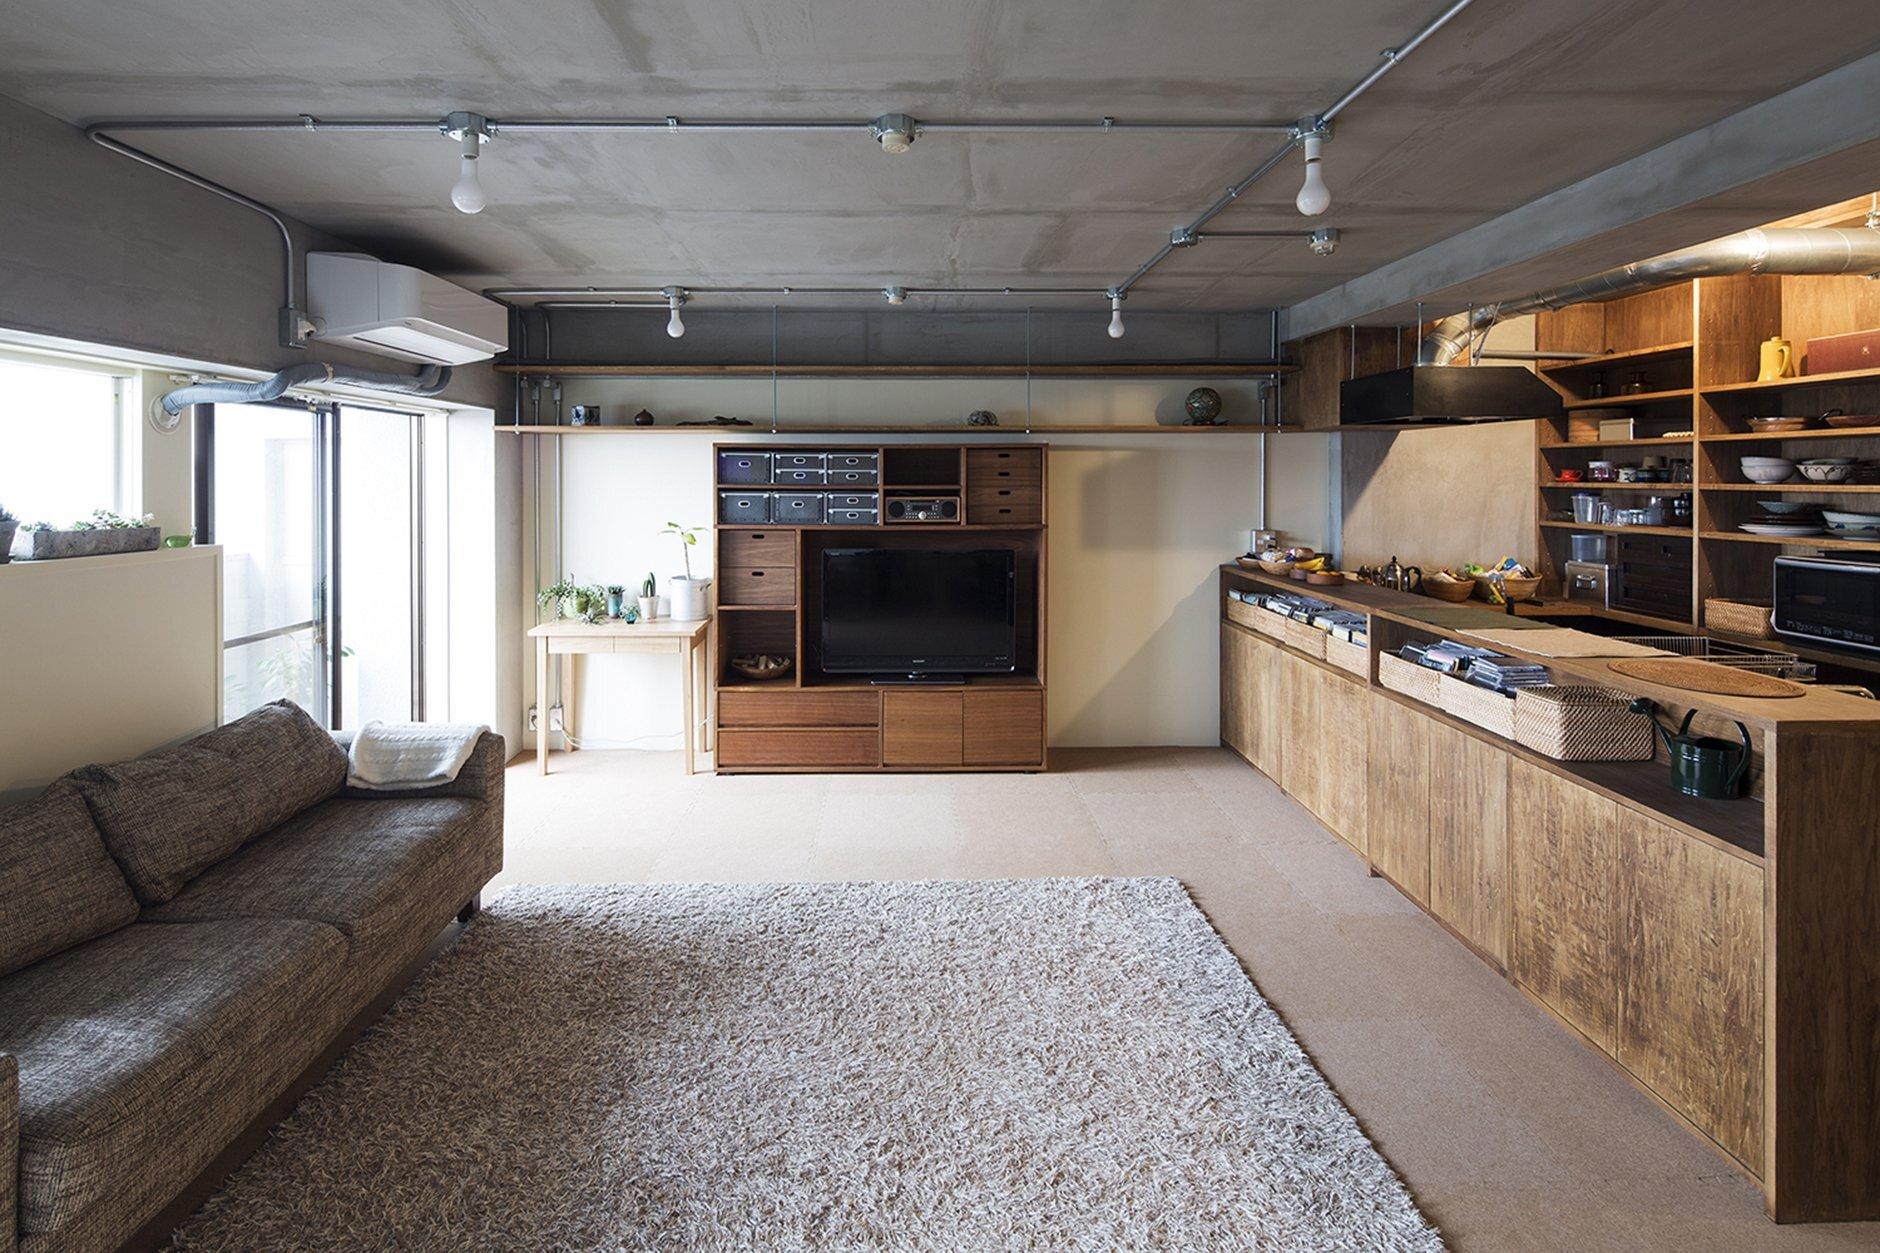 Gakugeidaigaku - Yuichi Yoshida & Associates - Japan - Living Area - Humble Homes